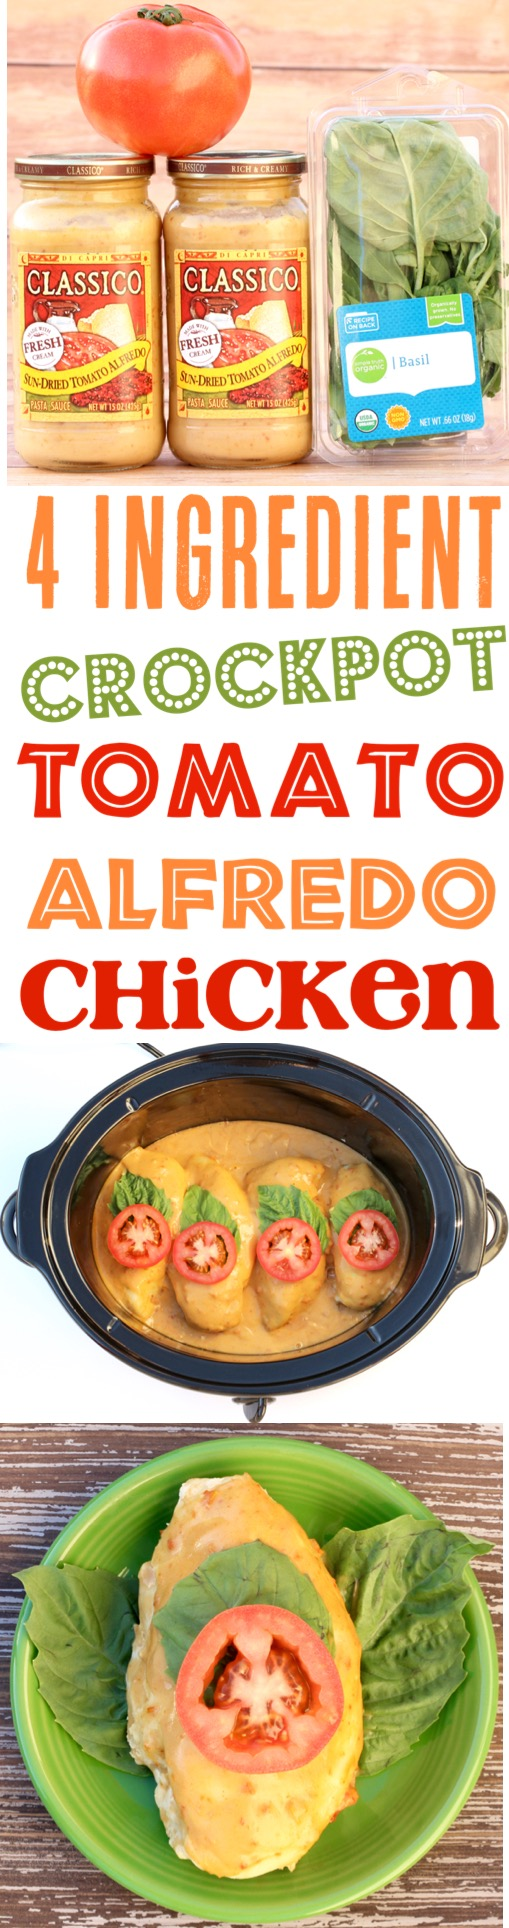 Crockpot Alfredo Chicken Easy Tomato Basil Slow Cooker Alfredo